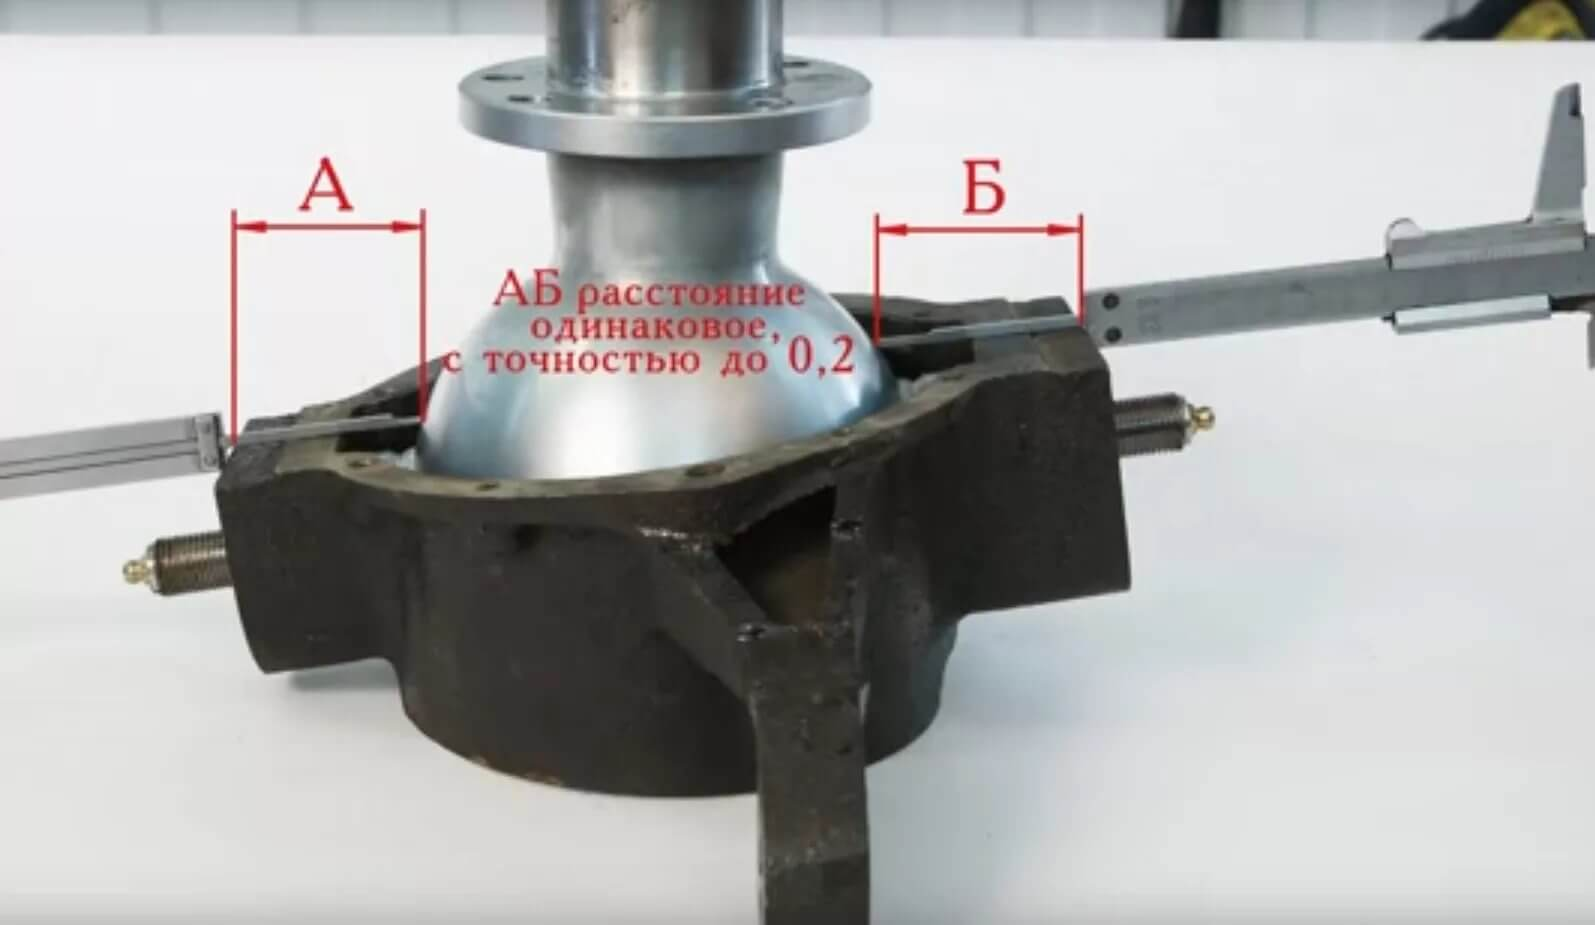 Проверка зазоров шаровой опоры штангенциркулем